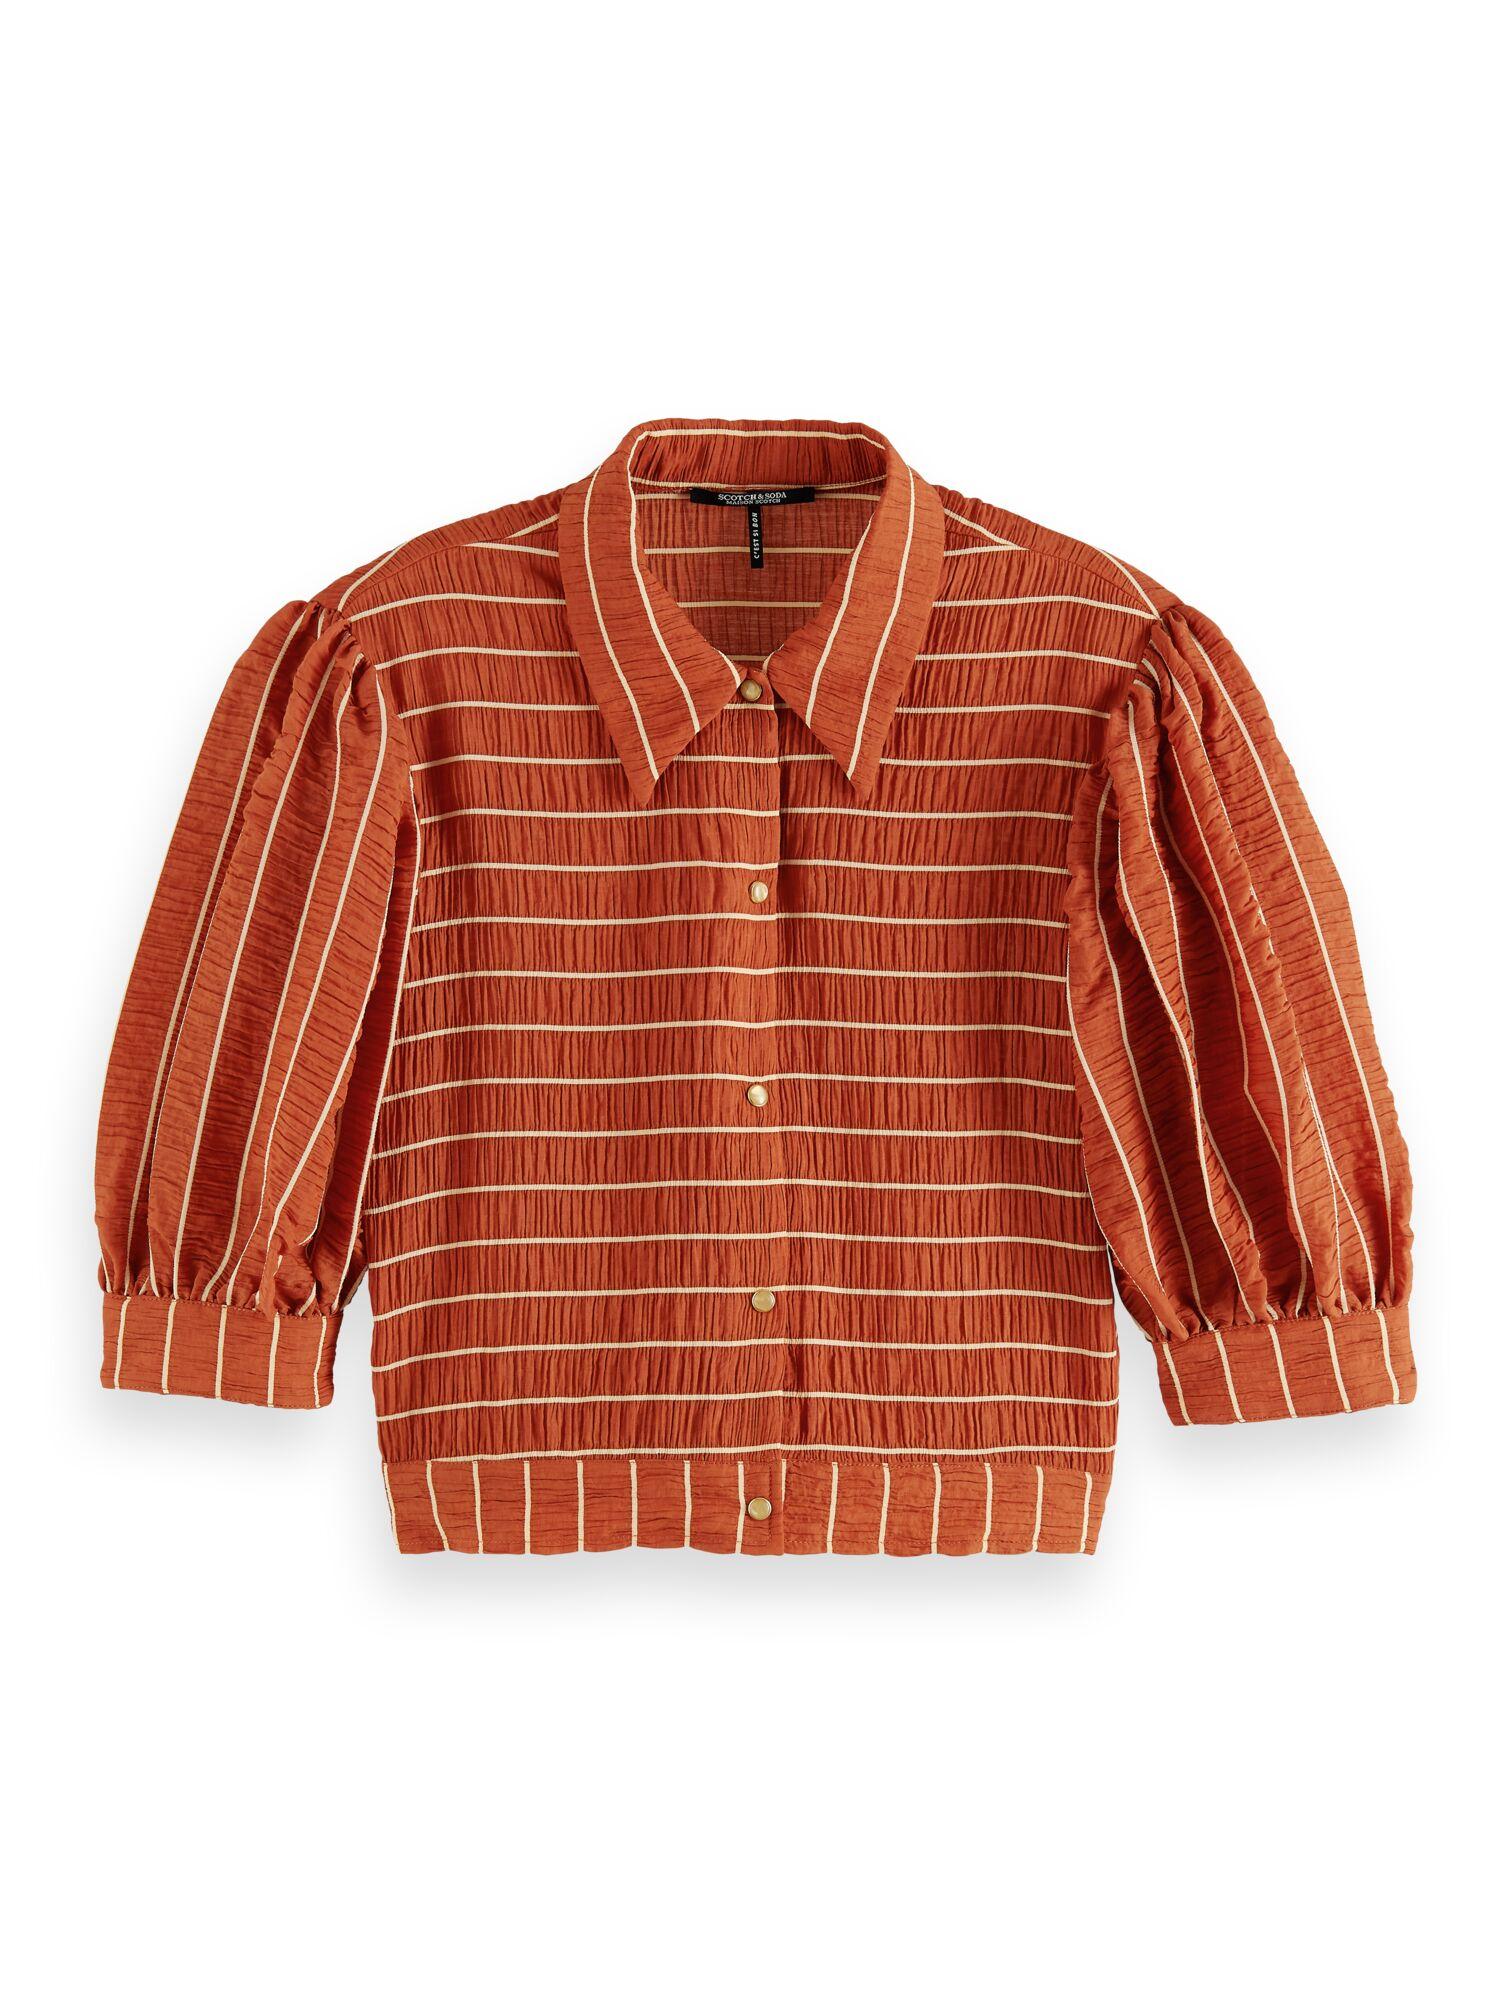 Scotch & Soda | Short sleeve Tencel mix shirt in seersucker stripe